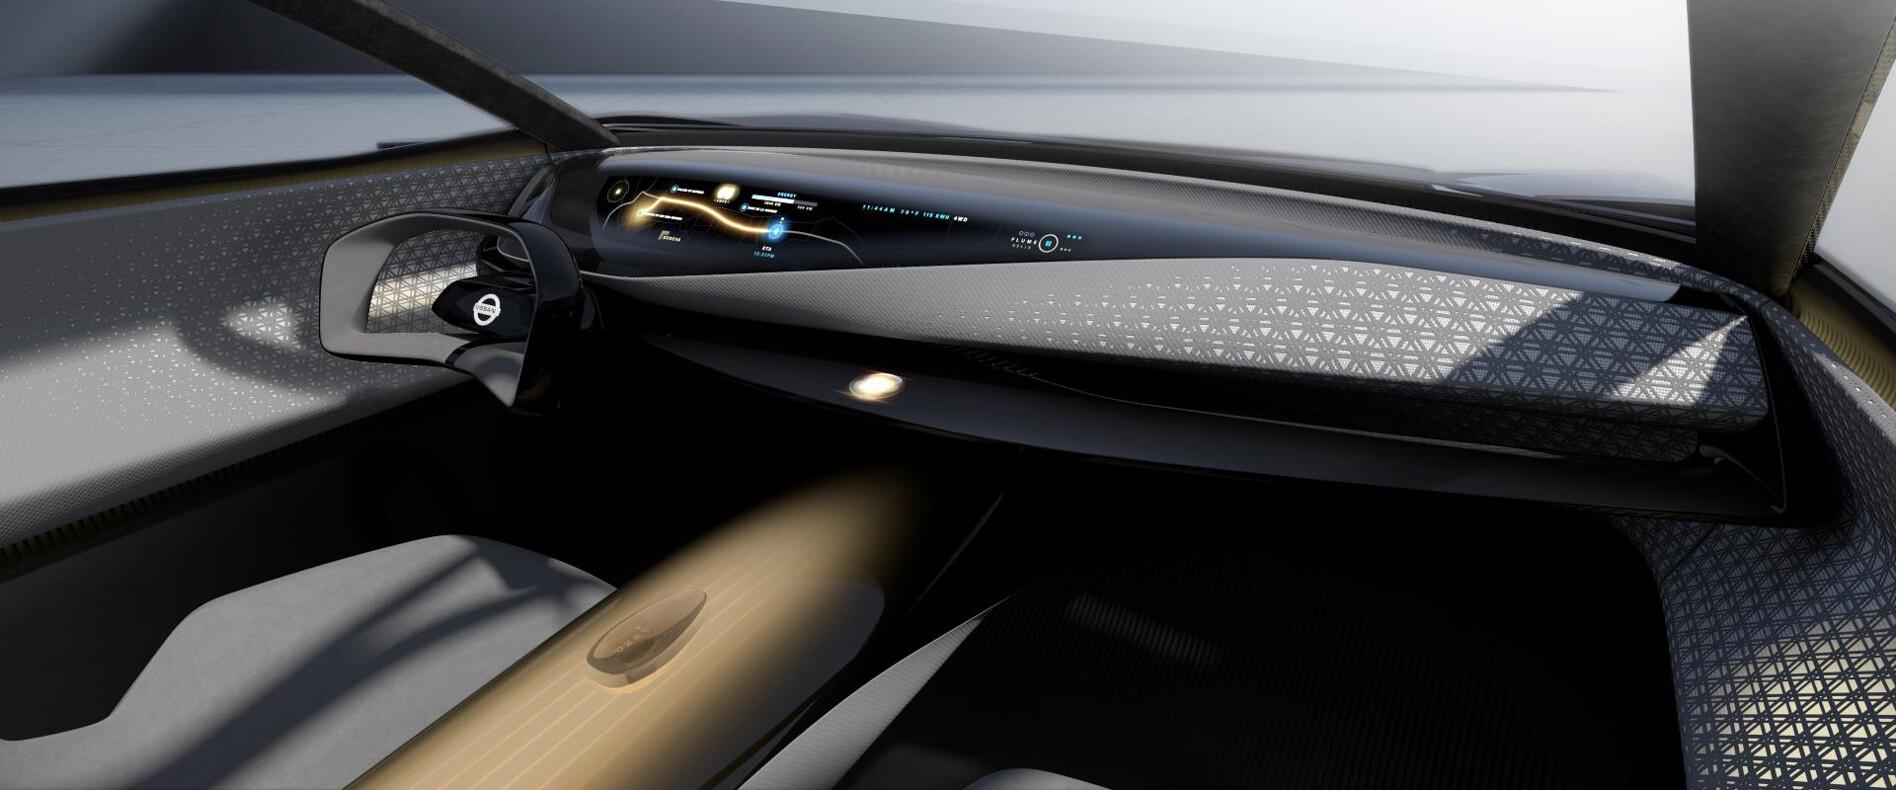 Nissan IMQ Concept 7 Jpg